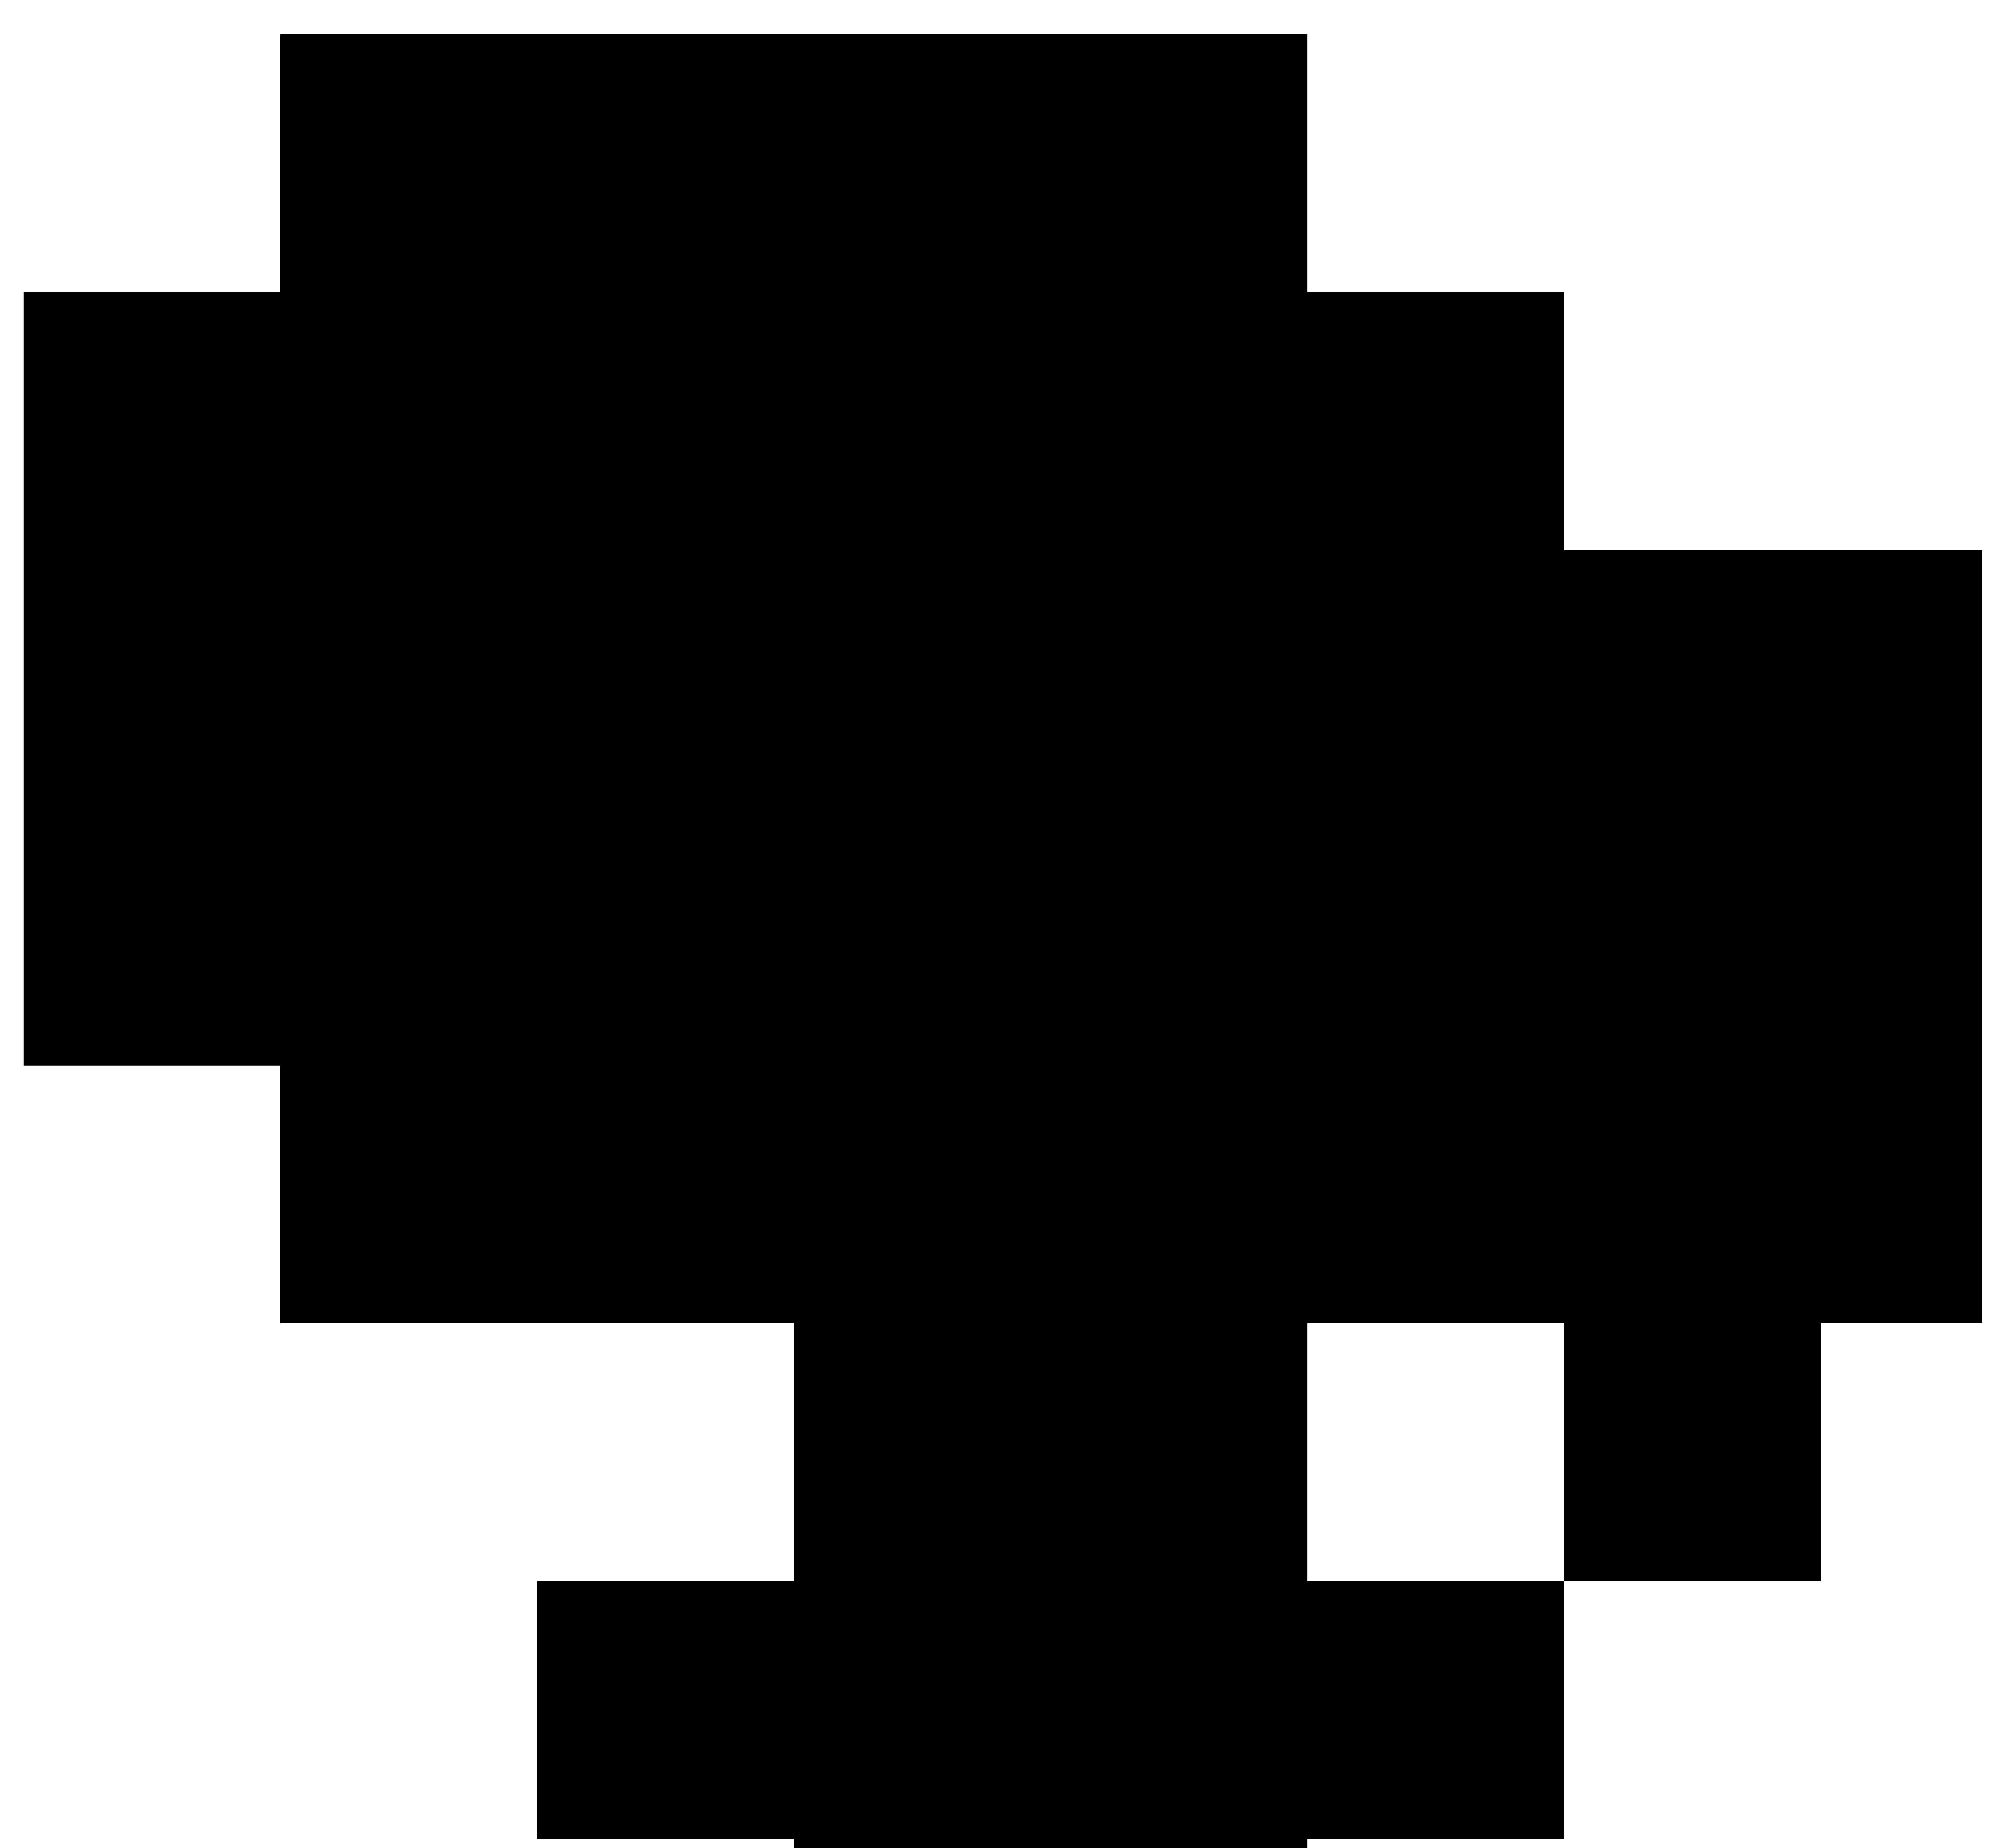 Palms Silhouette Clip Art PNG Image.